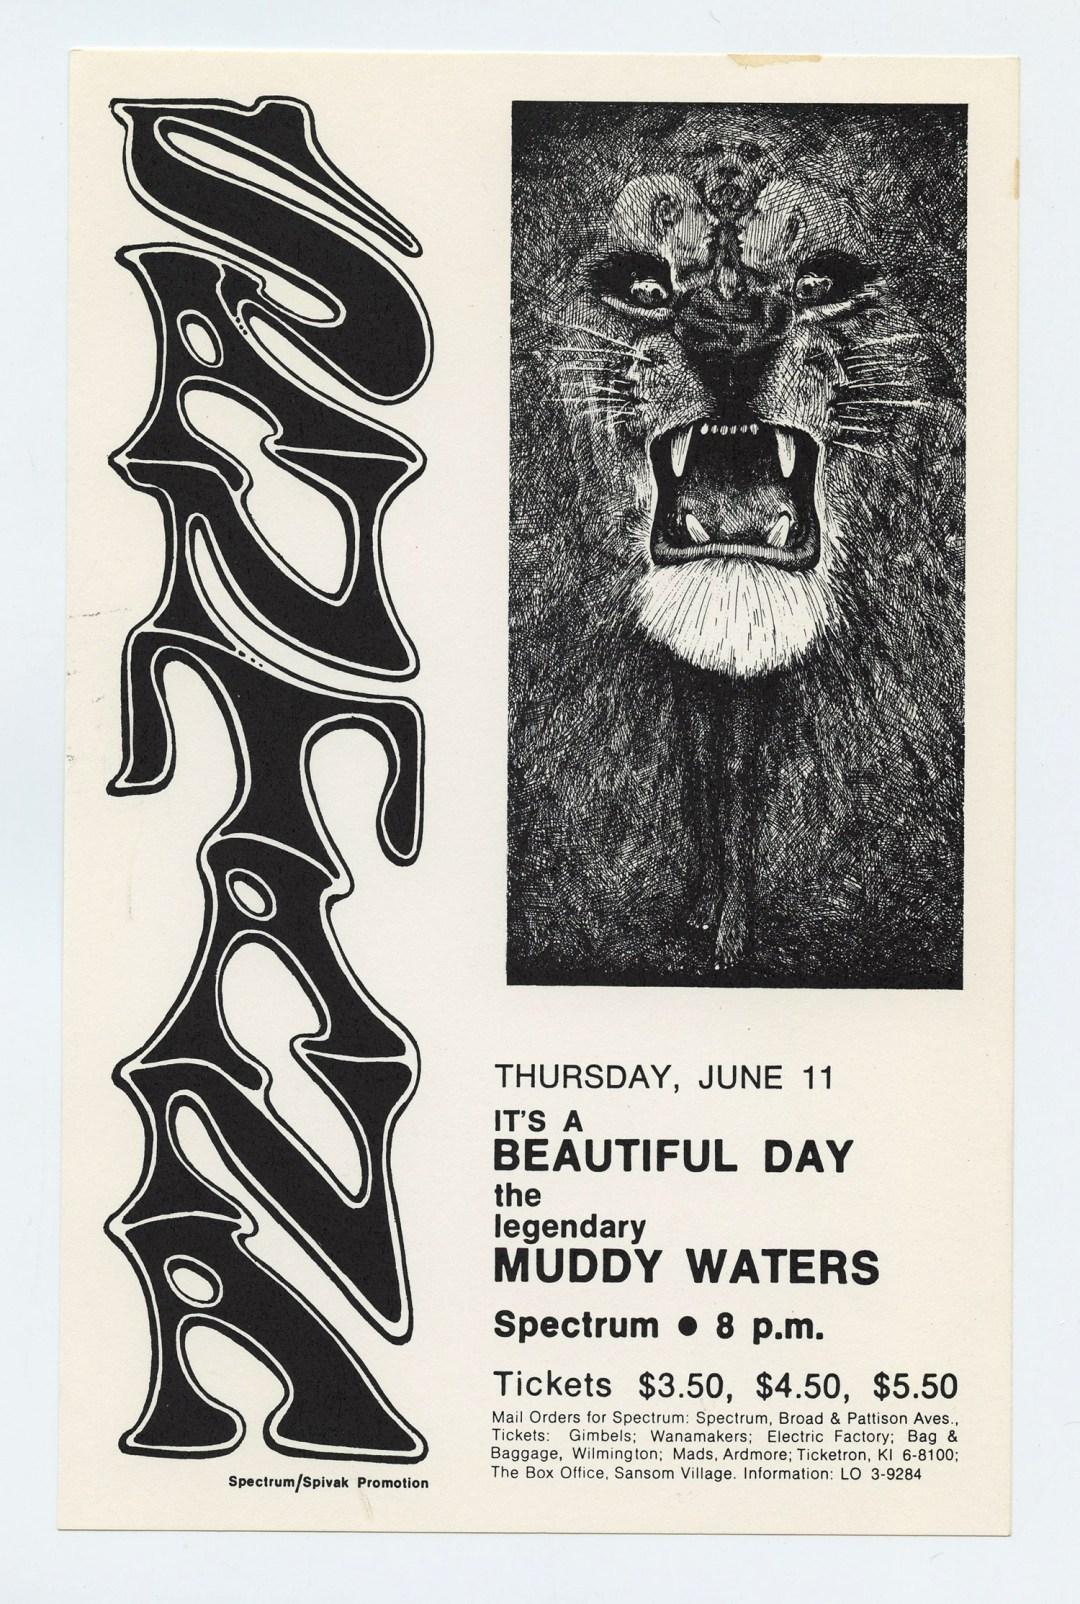 Santana Muddy Waters Handbill 1969 Jun 11 Spectrum Philadelphia Lee Conklin